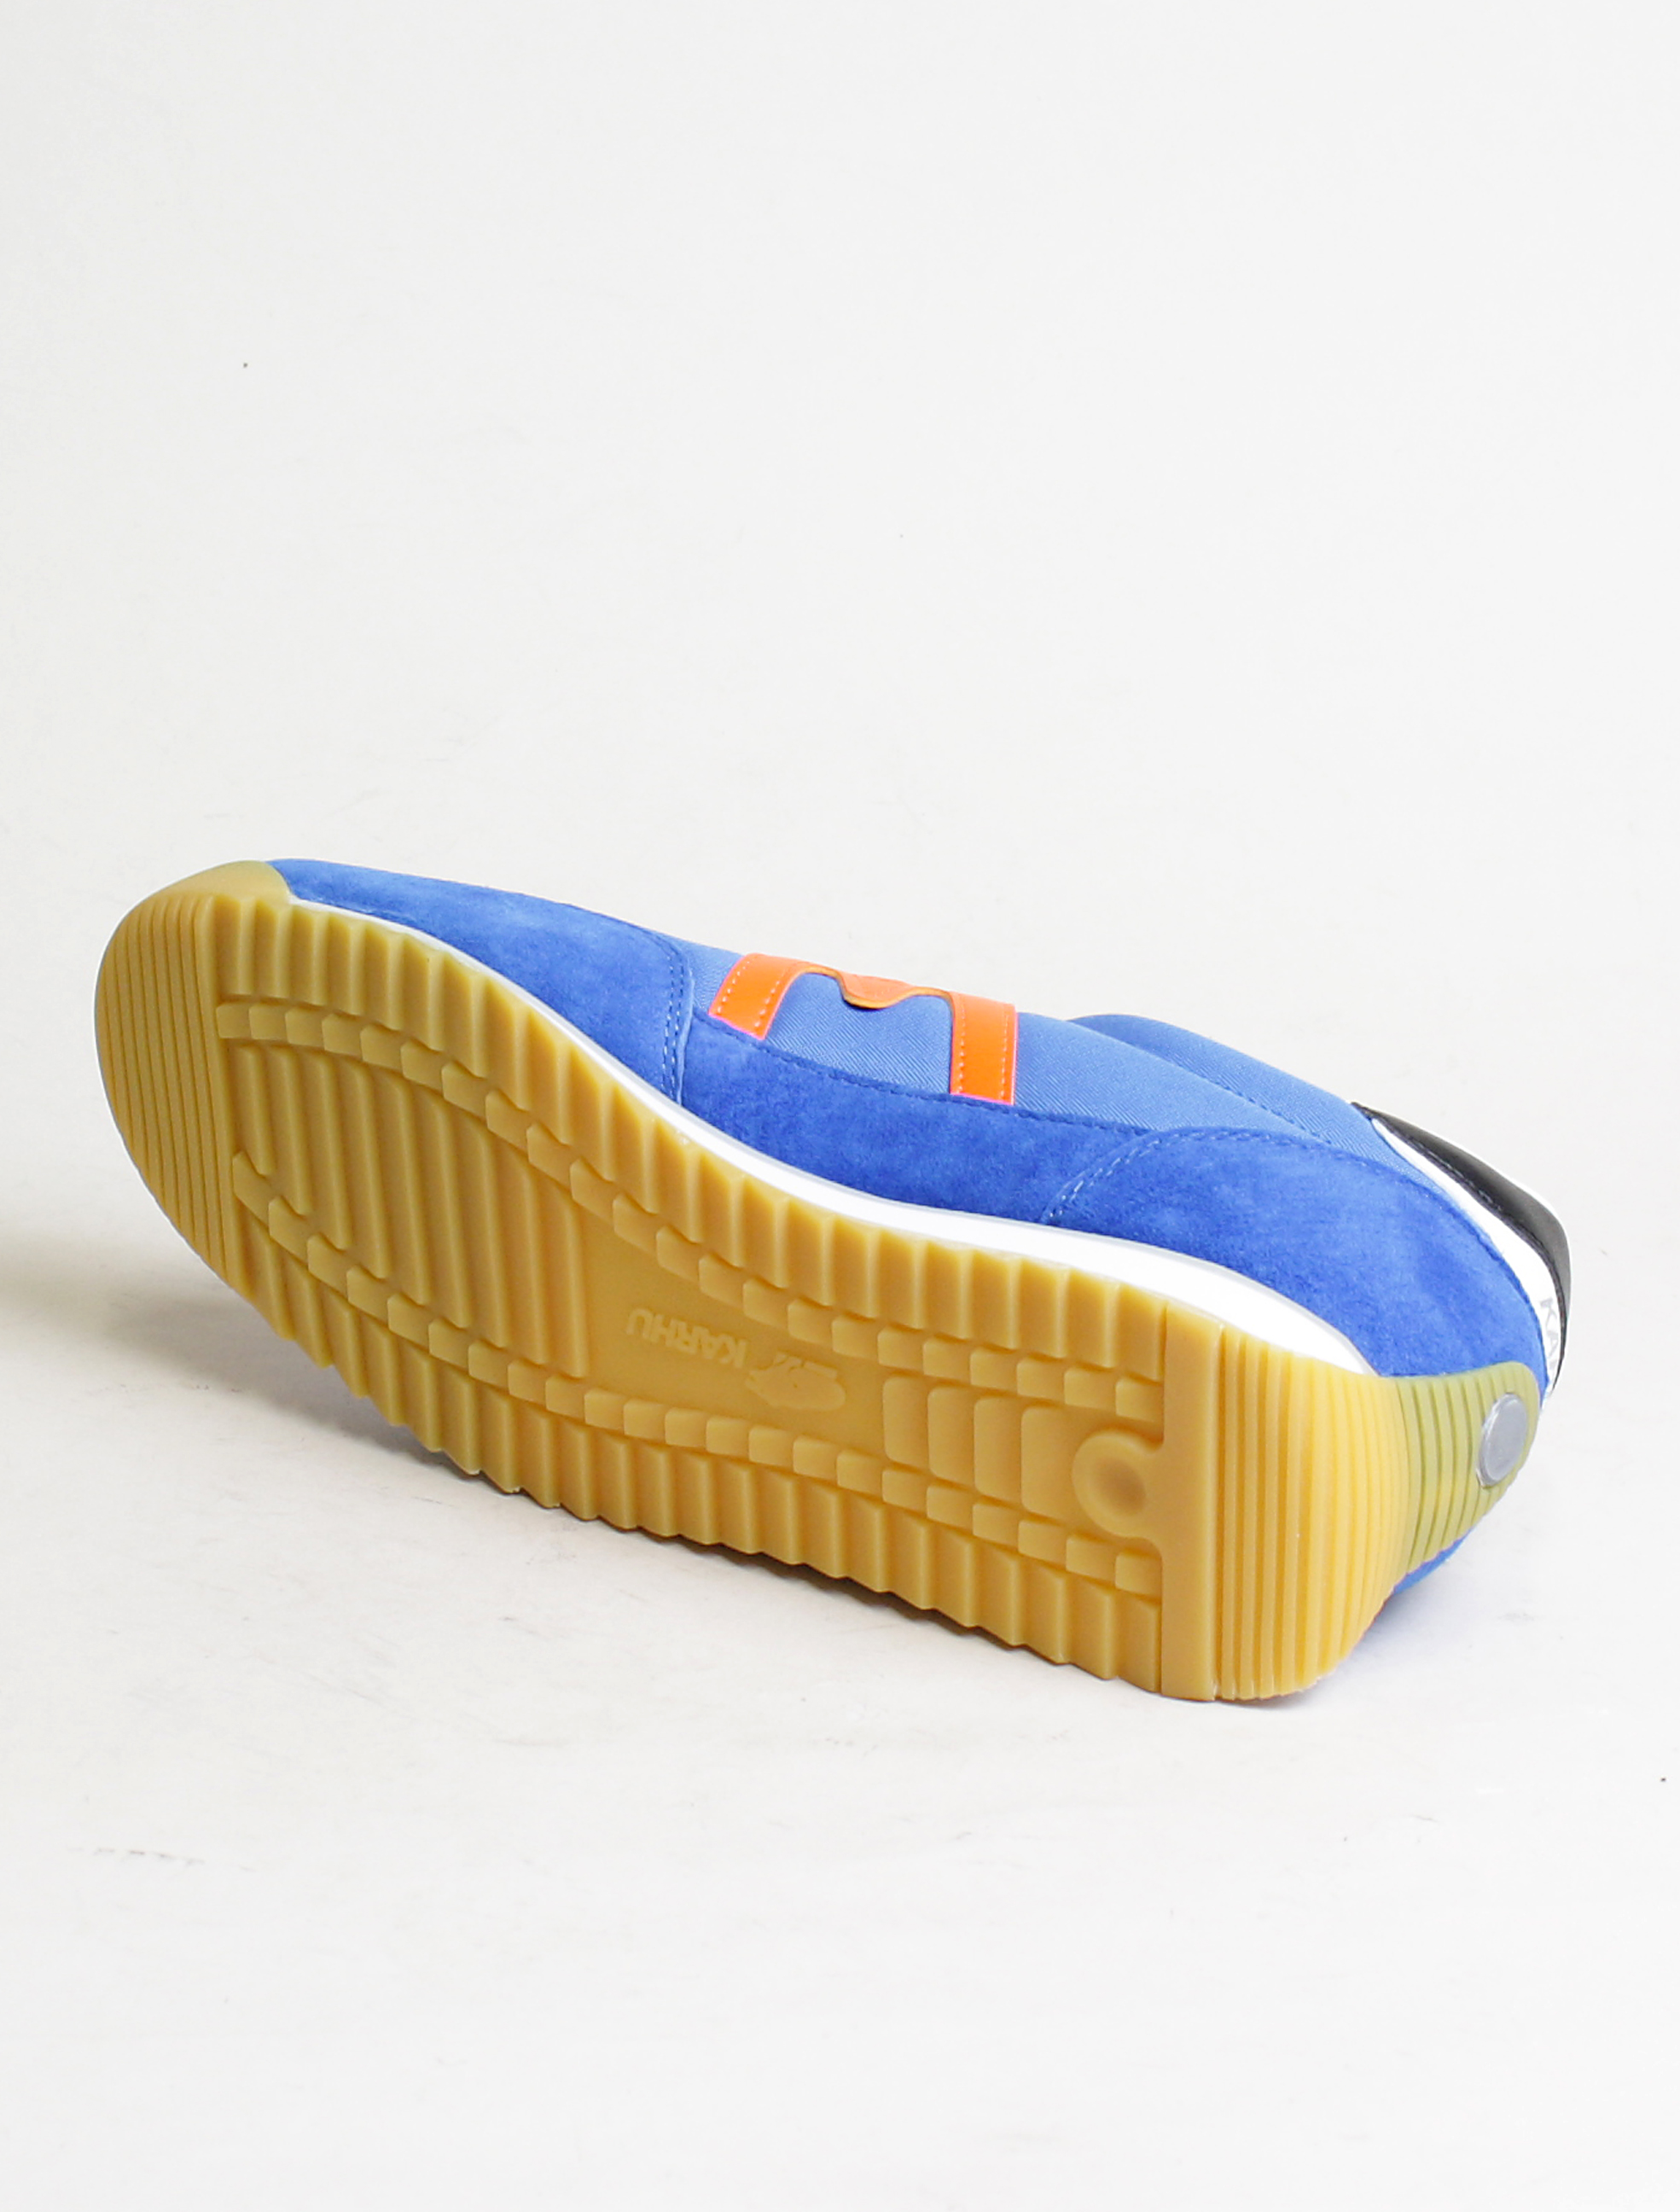 Karhu sneakers Championair Blue Aster Flame suola